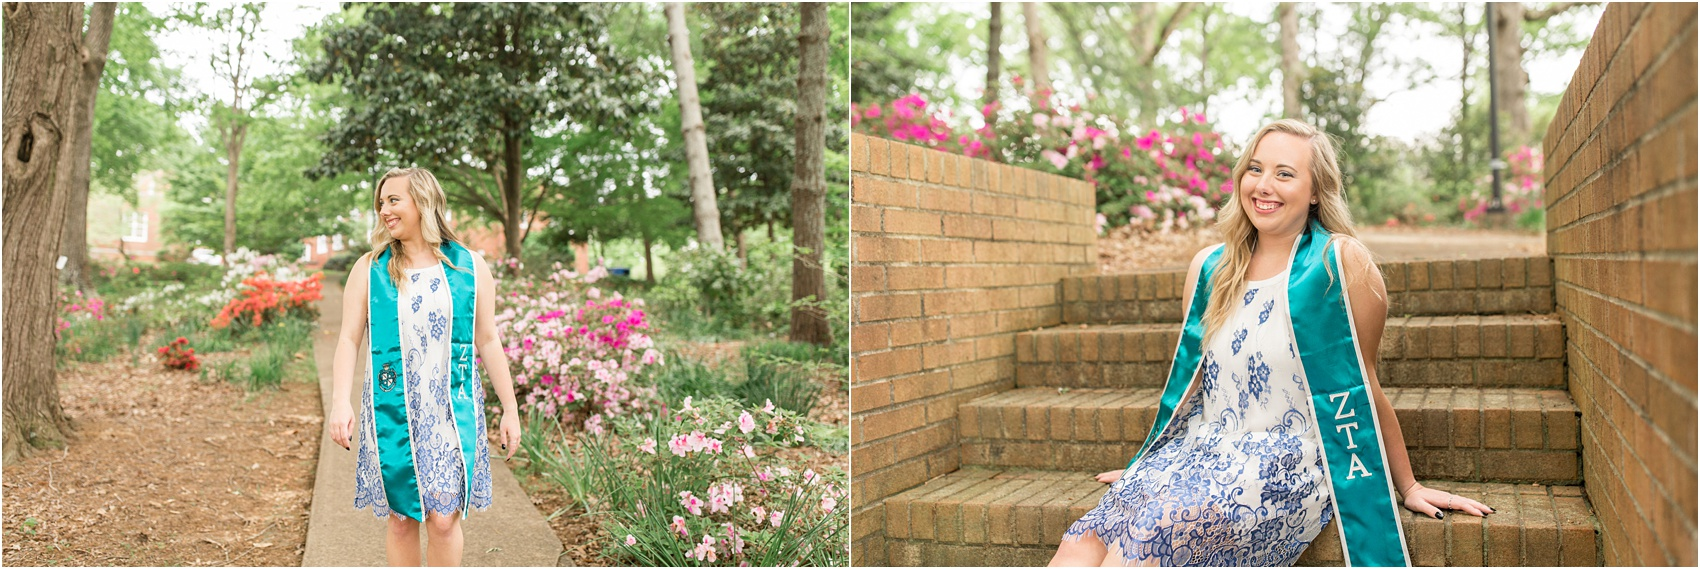 Savannah Eve Photography- Avery Miller's Grad Pics-25.jpg